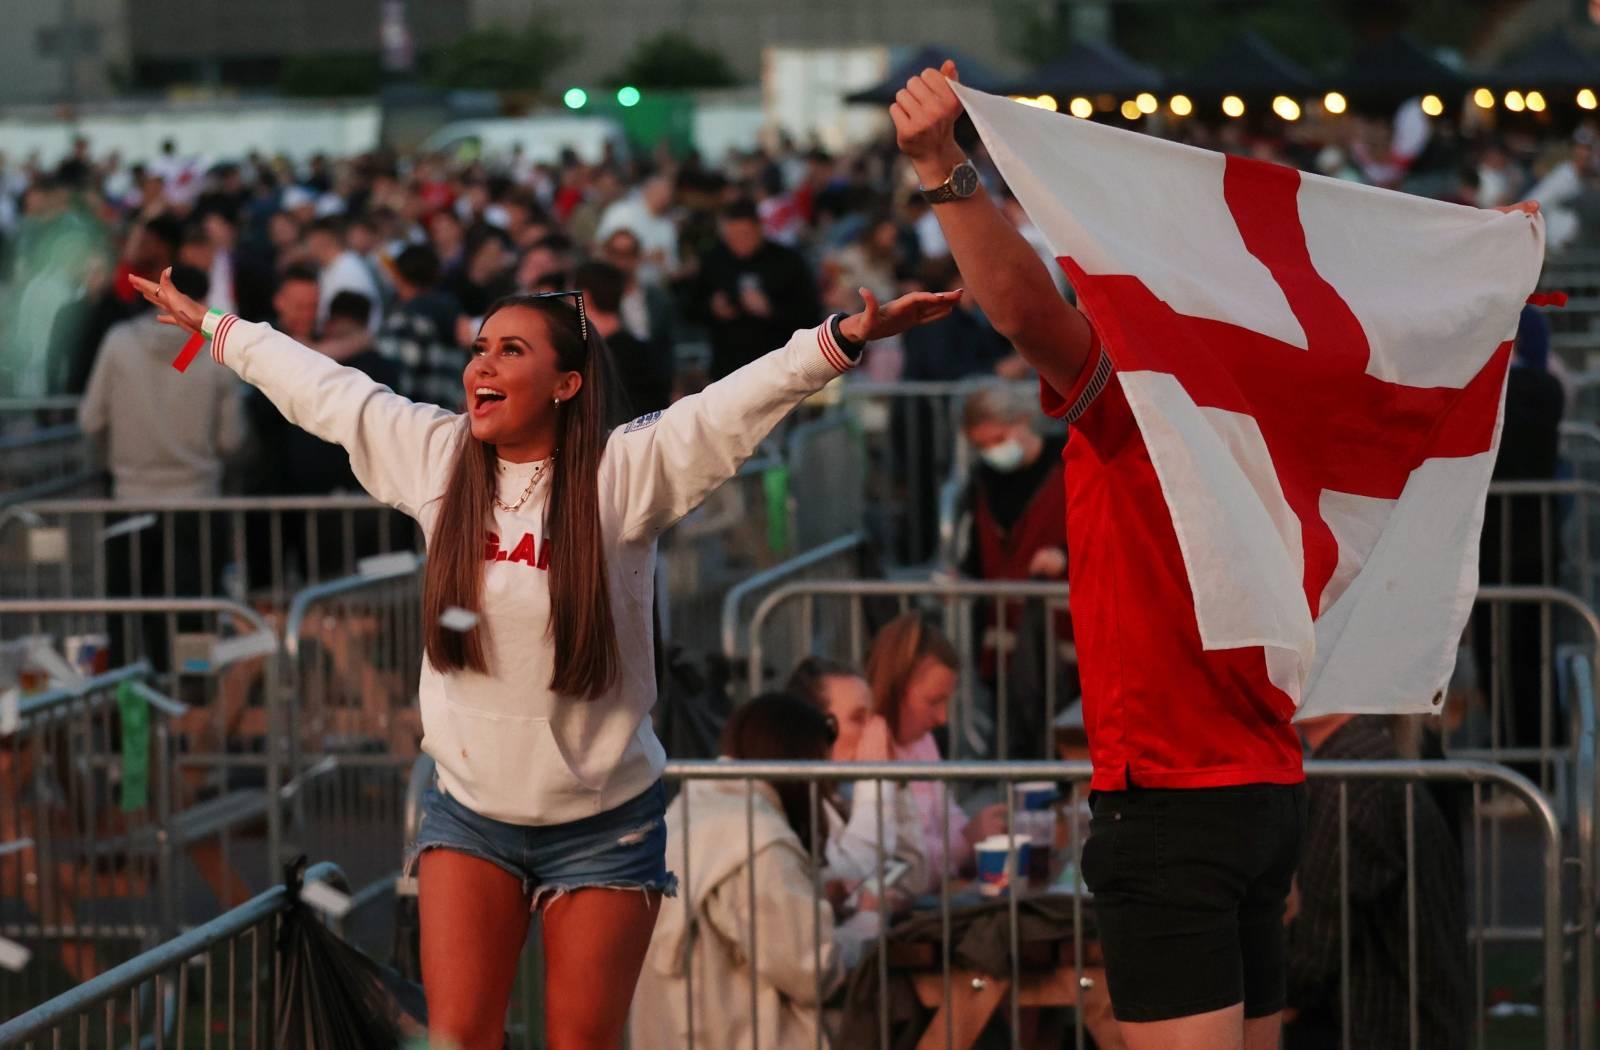 Euro 2020 - Group D - Fans gather for Czech Republic v England